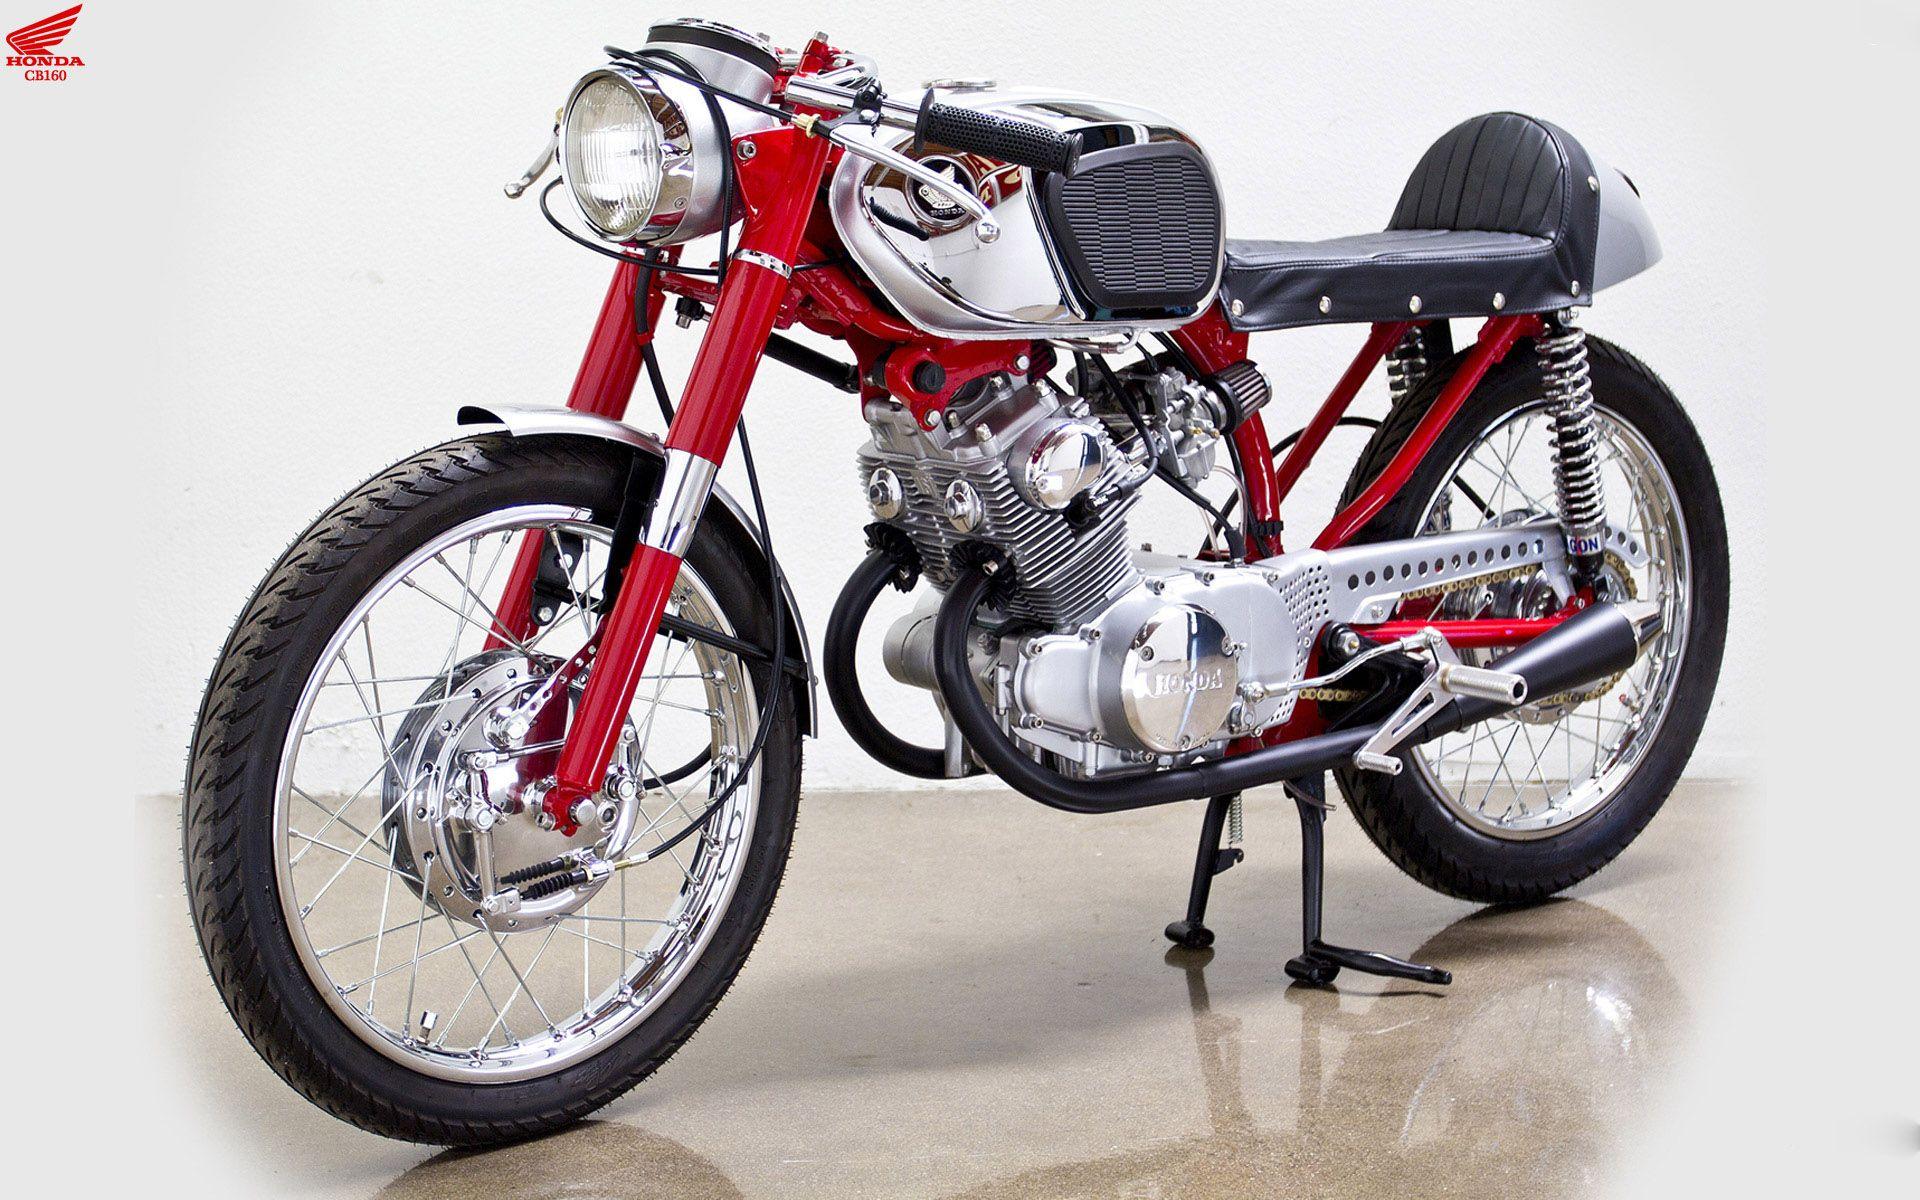 Honda CB HD Wallpaper | Ultra HD Motorcycles Wallpapers ...